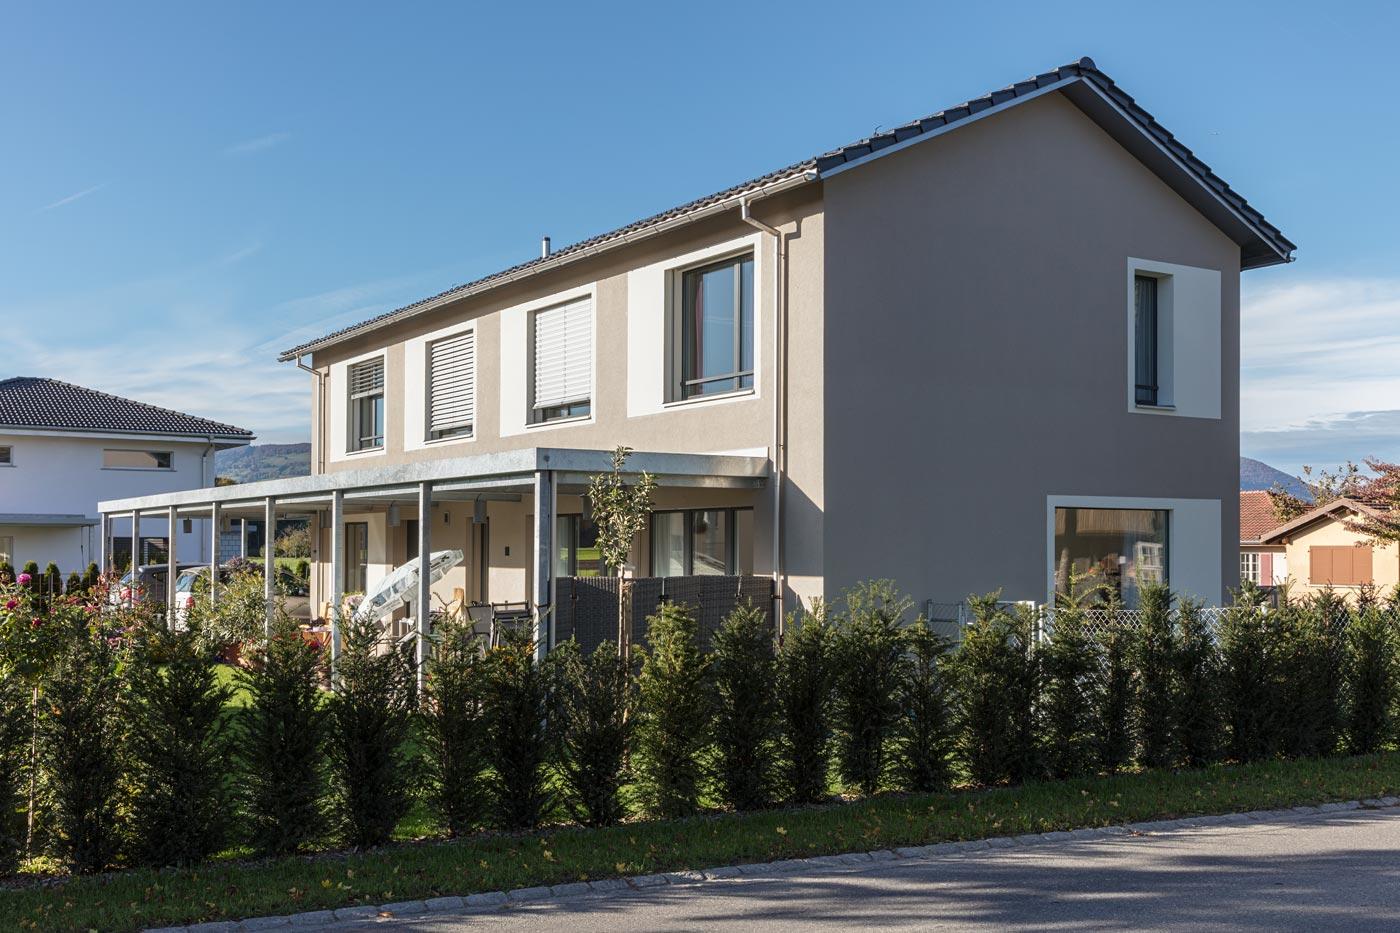 fassade, dach, flachdach, vordach, metallunterstand, spenglerei